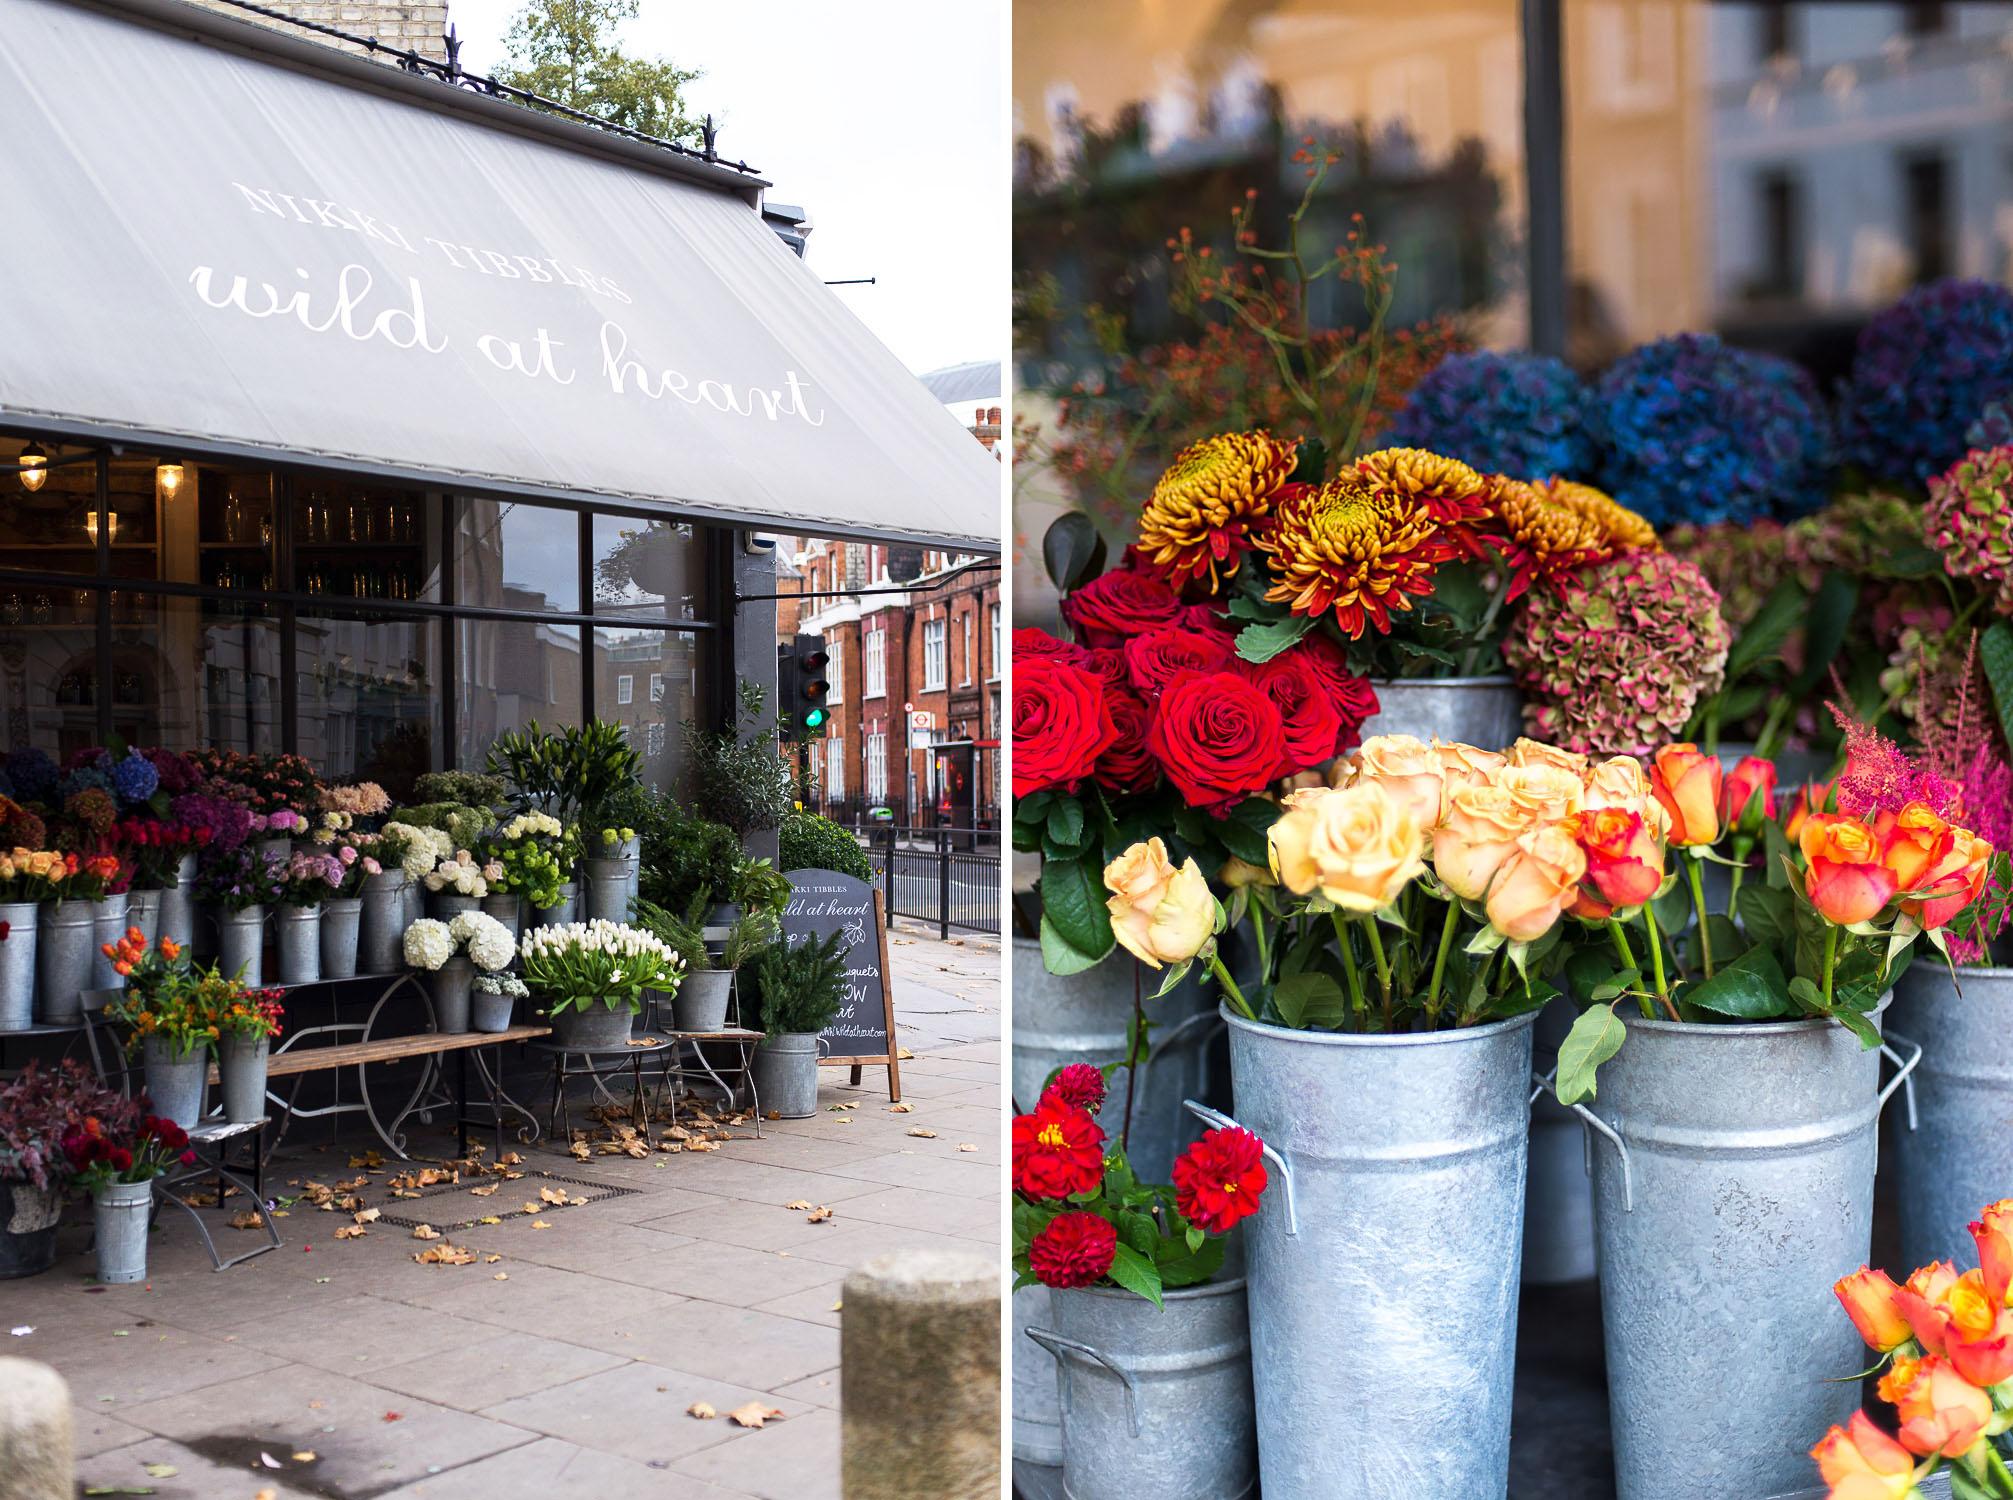 Home | Flowers By Van Twisk - Pimlico London florist since ...